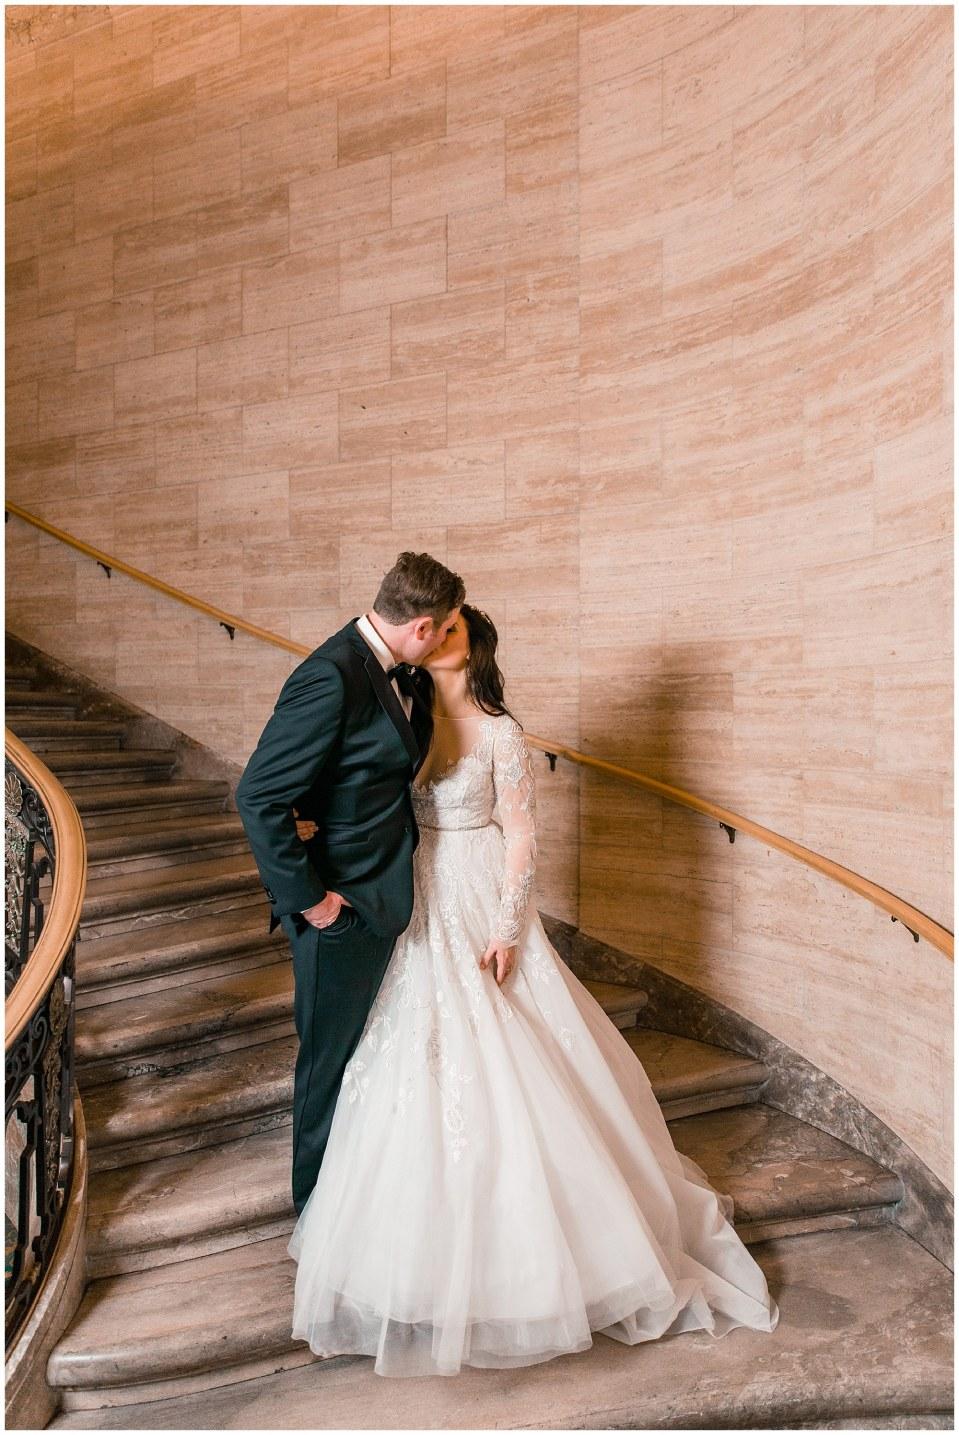 Cooper & Anna's Black Tie & Maroon Wedding at The Hotel DuPont in Wilmington, DE Photos_0084.jpg